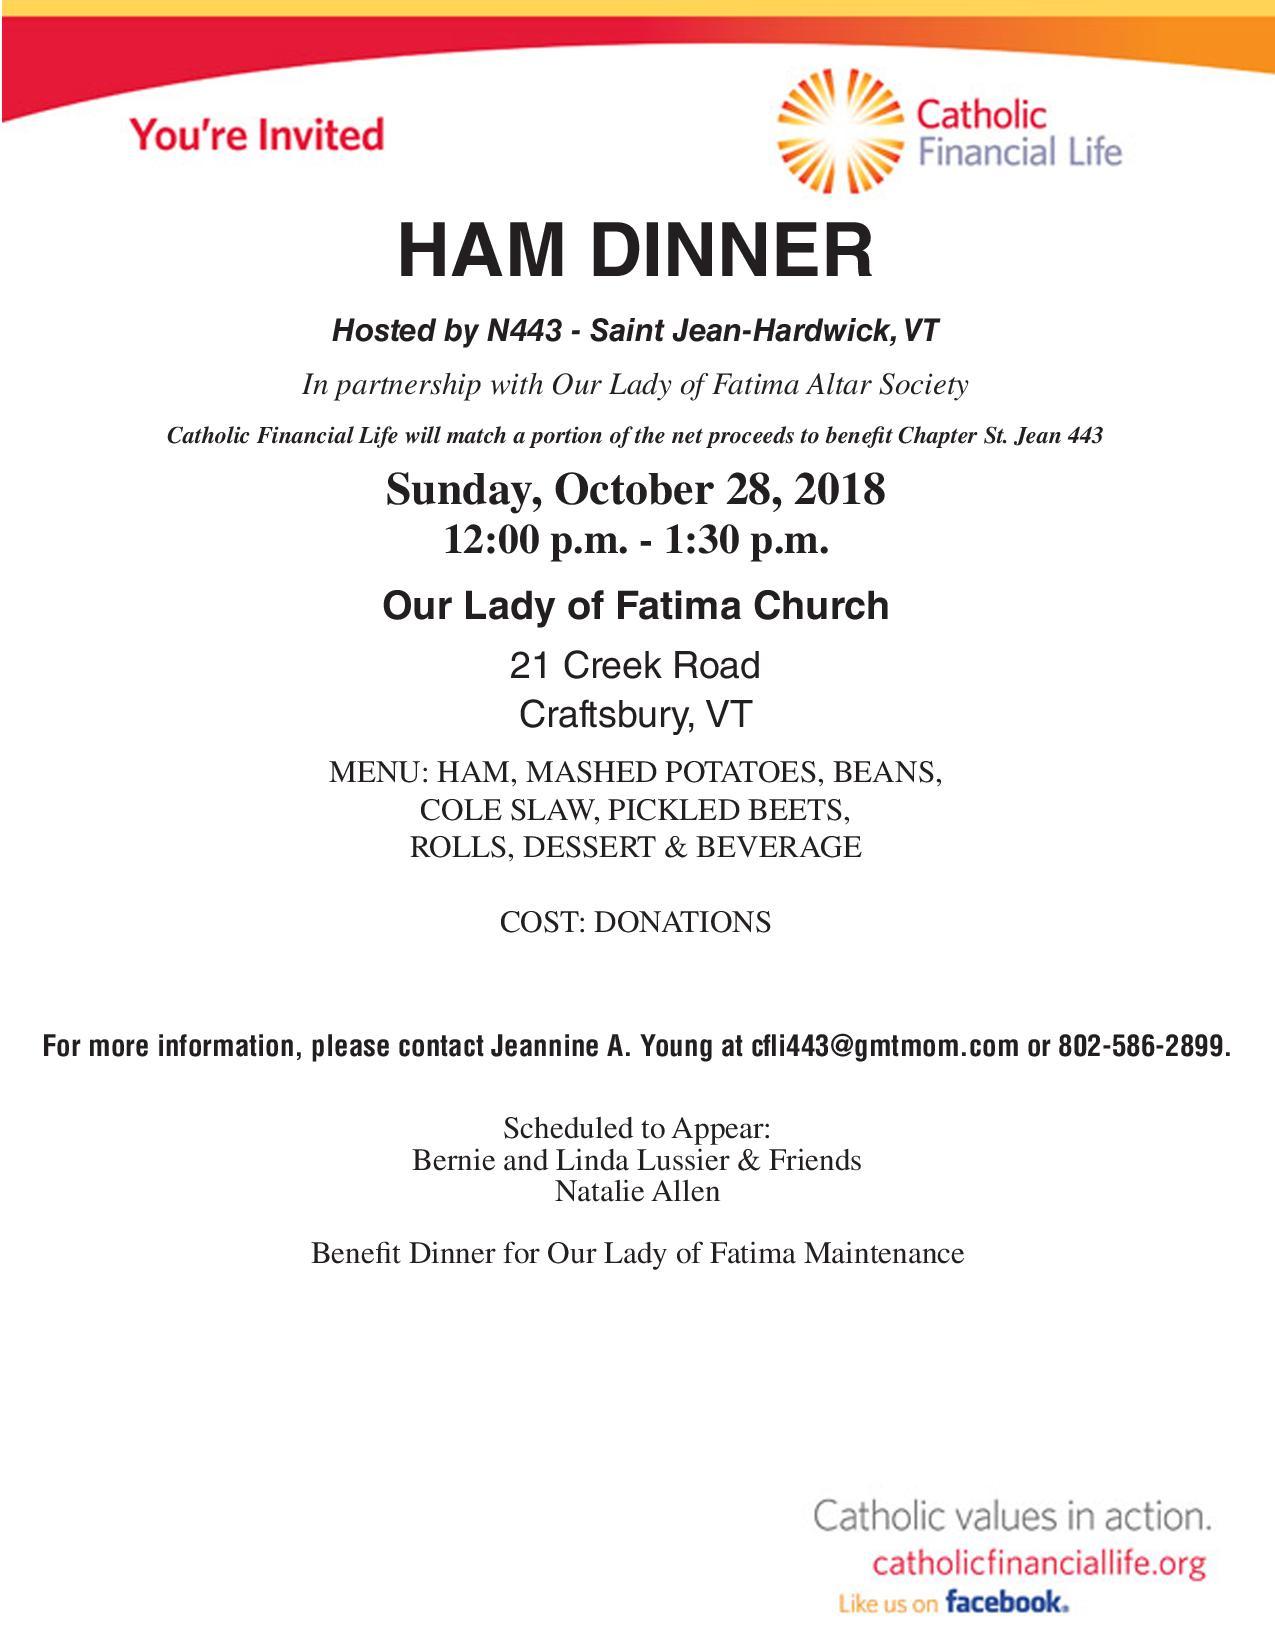 Ham Dinner FLyer 2018-page-001.jpg